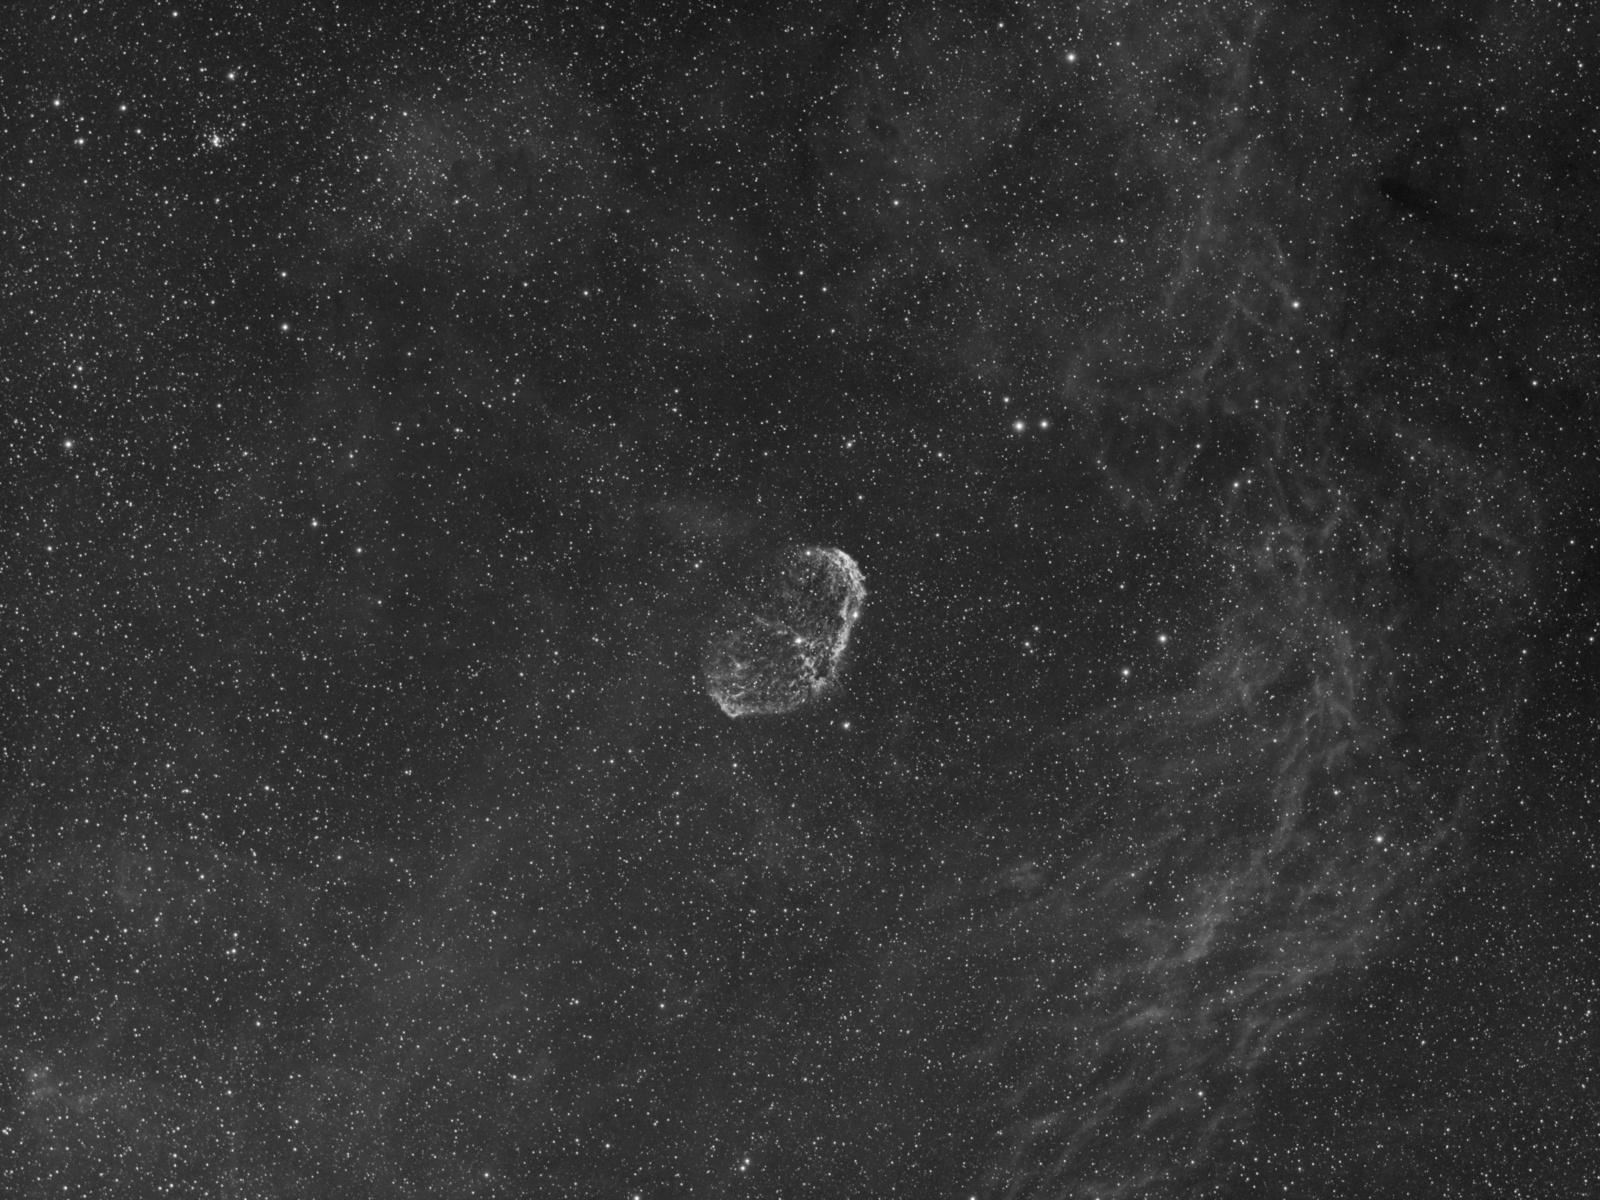 1125107534_NGC6888pixps.thumb.jpg.61778f638c24353507c3a1e9ca118592.jpg